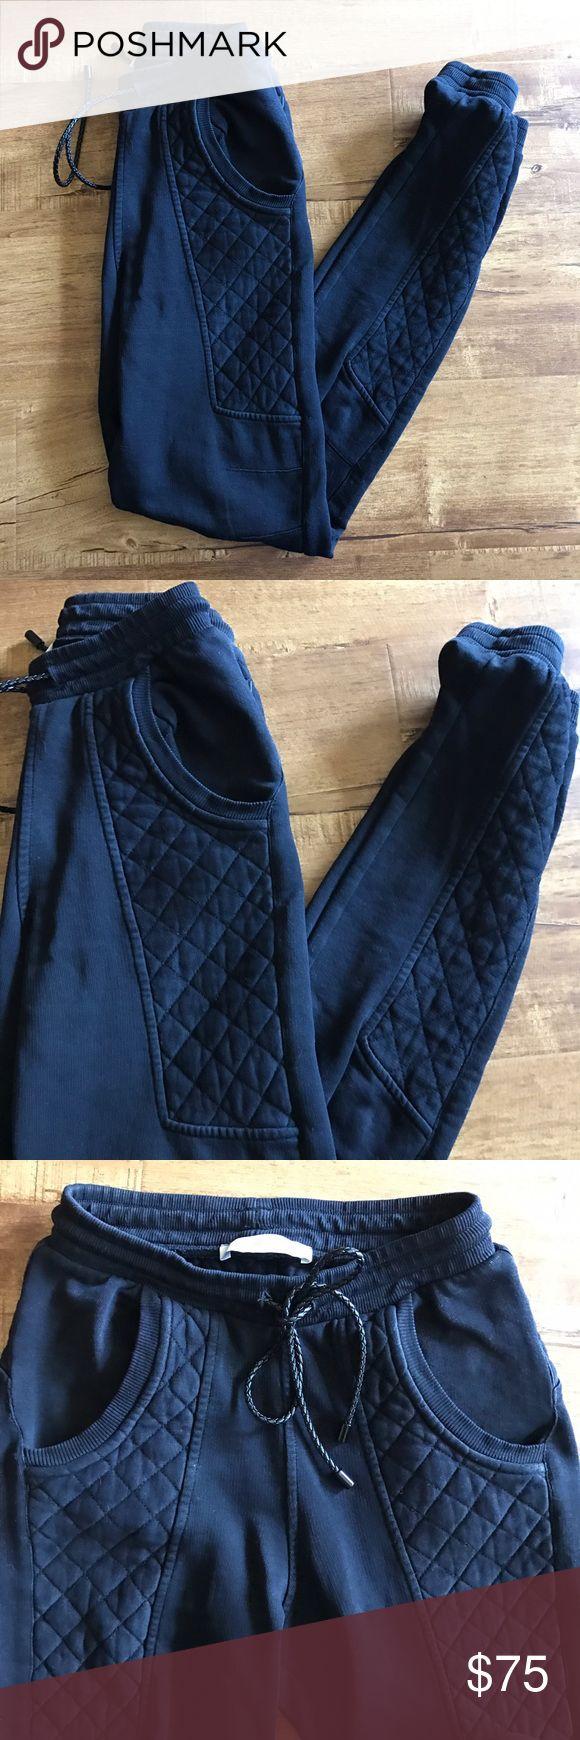 Pierre Balmain Black Joggers Sweatpants XS Pierre Balmain black joggers.  Size 0.  Originally $245.  Never worn with tags. Pierre Balmain Pants Track Pants & Joggers